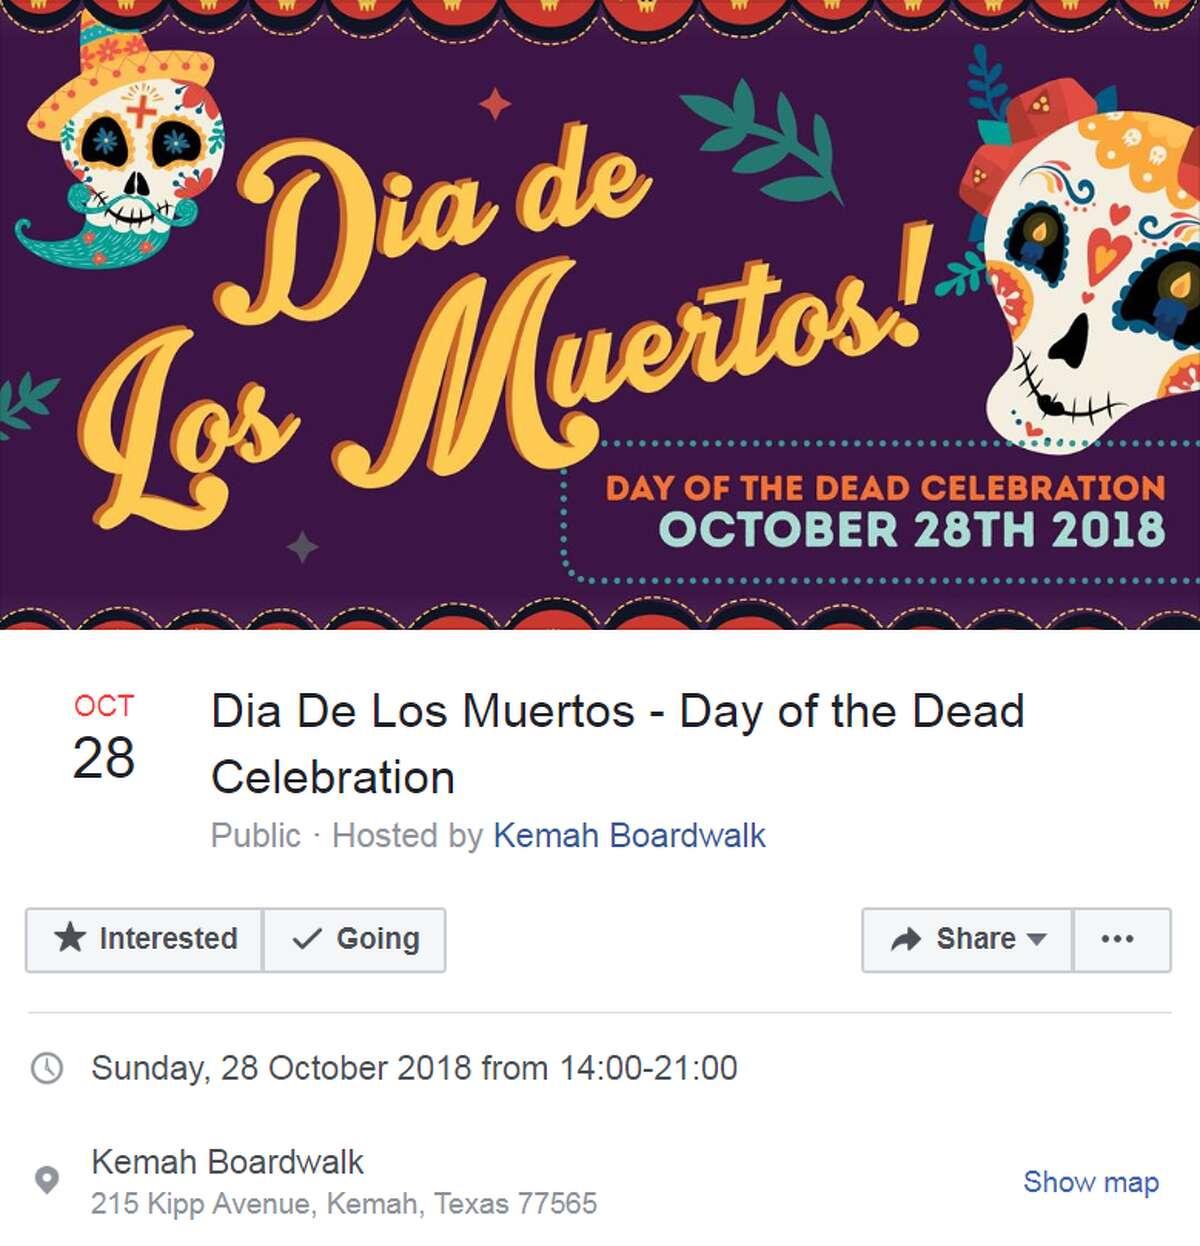 Dia De Los Muertos - Day of the Dead Celebration Oct. 28 from 2:00 - 9:00 p.m. 215 Kipp Avenue Hosted by Kemah Boardwalk More info